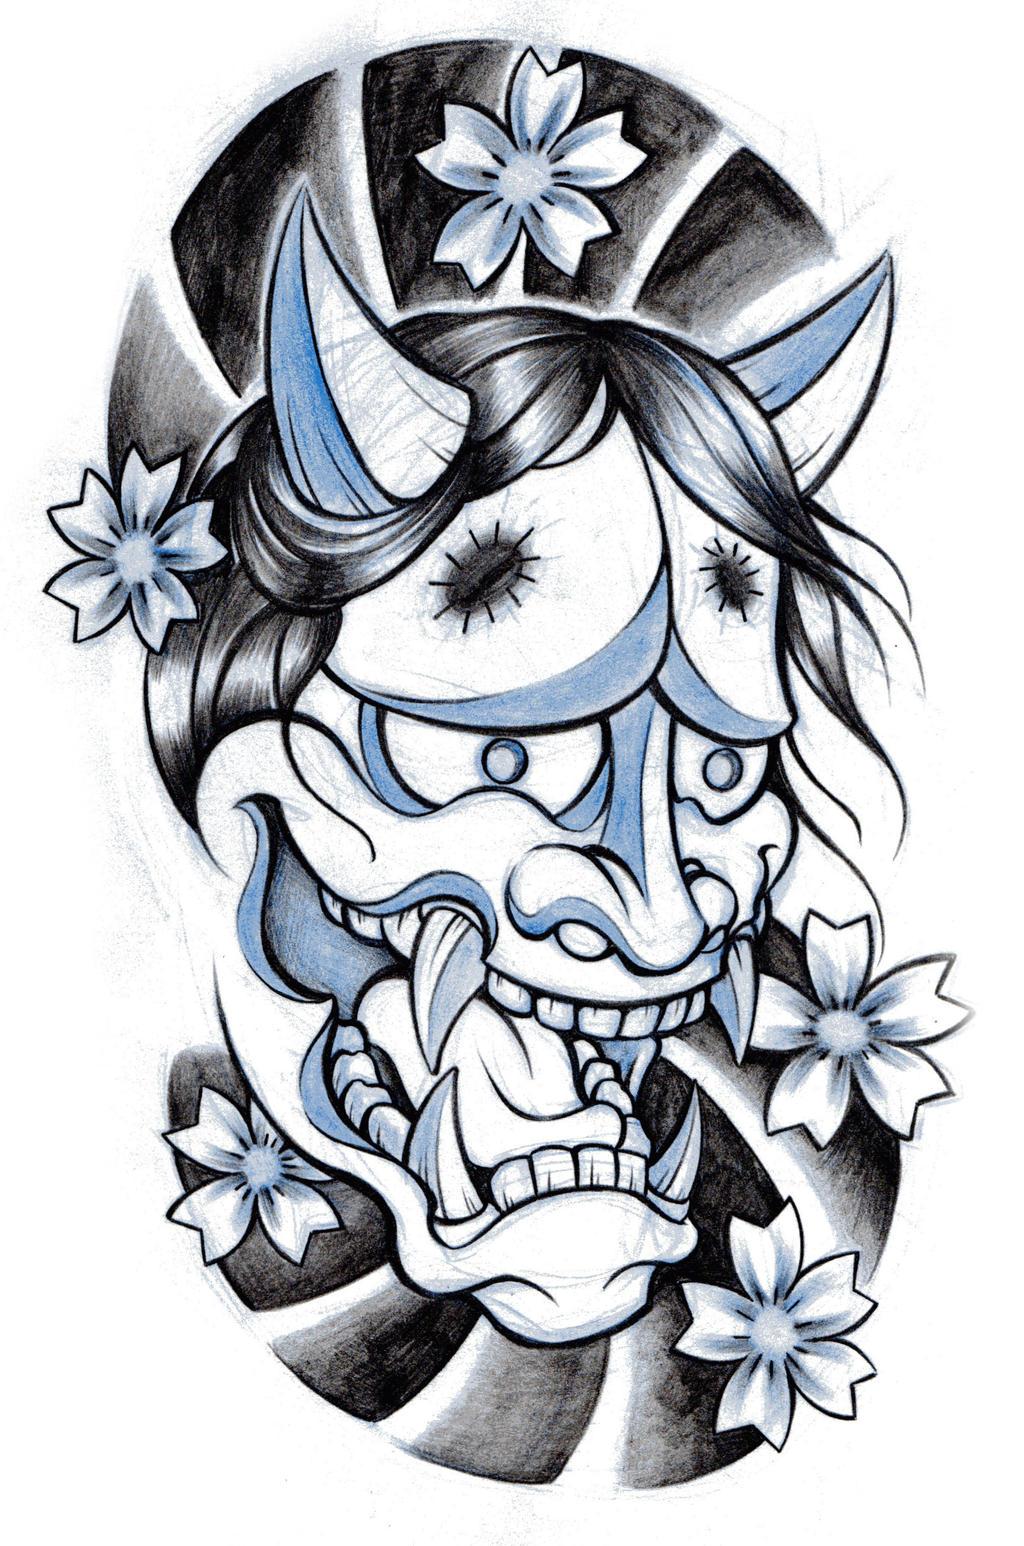 Hanya face by AbrahamGart on DeviantArt